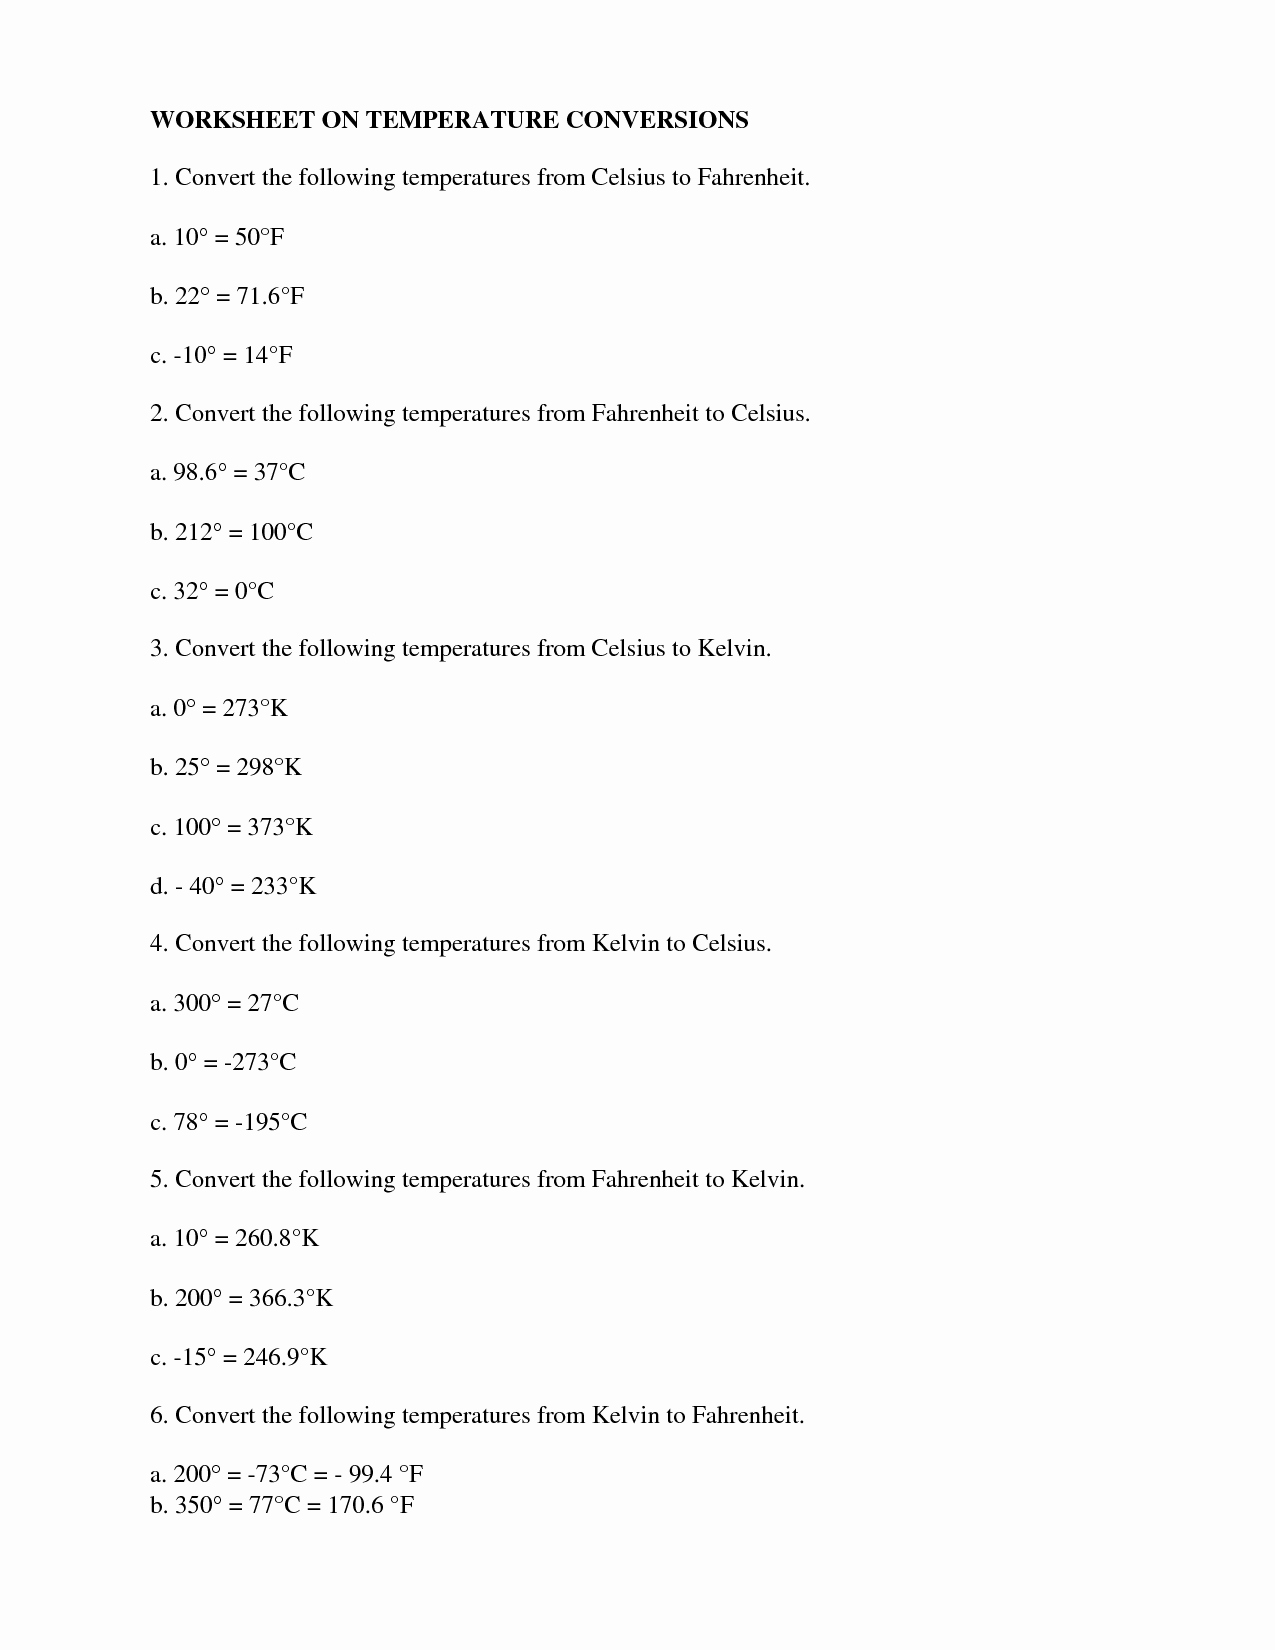 50 Temperature Conversion Worksheet Answer Key